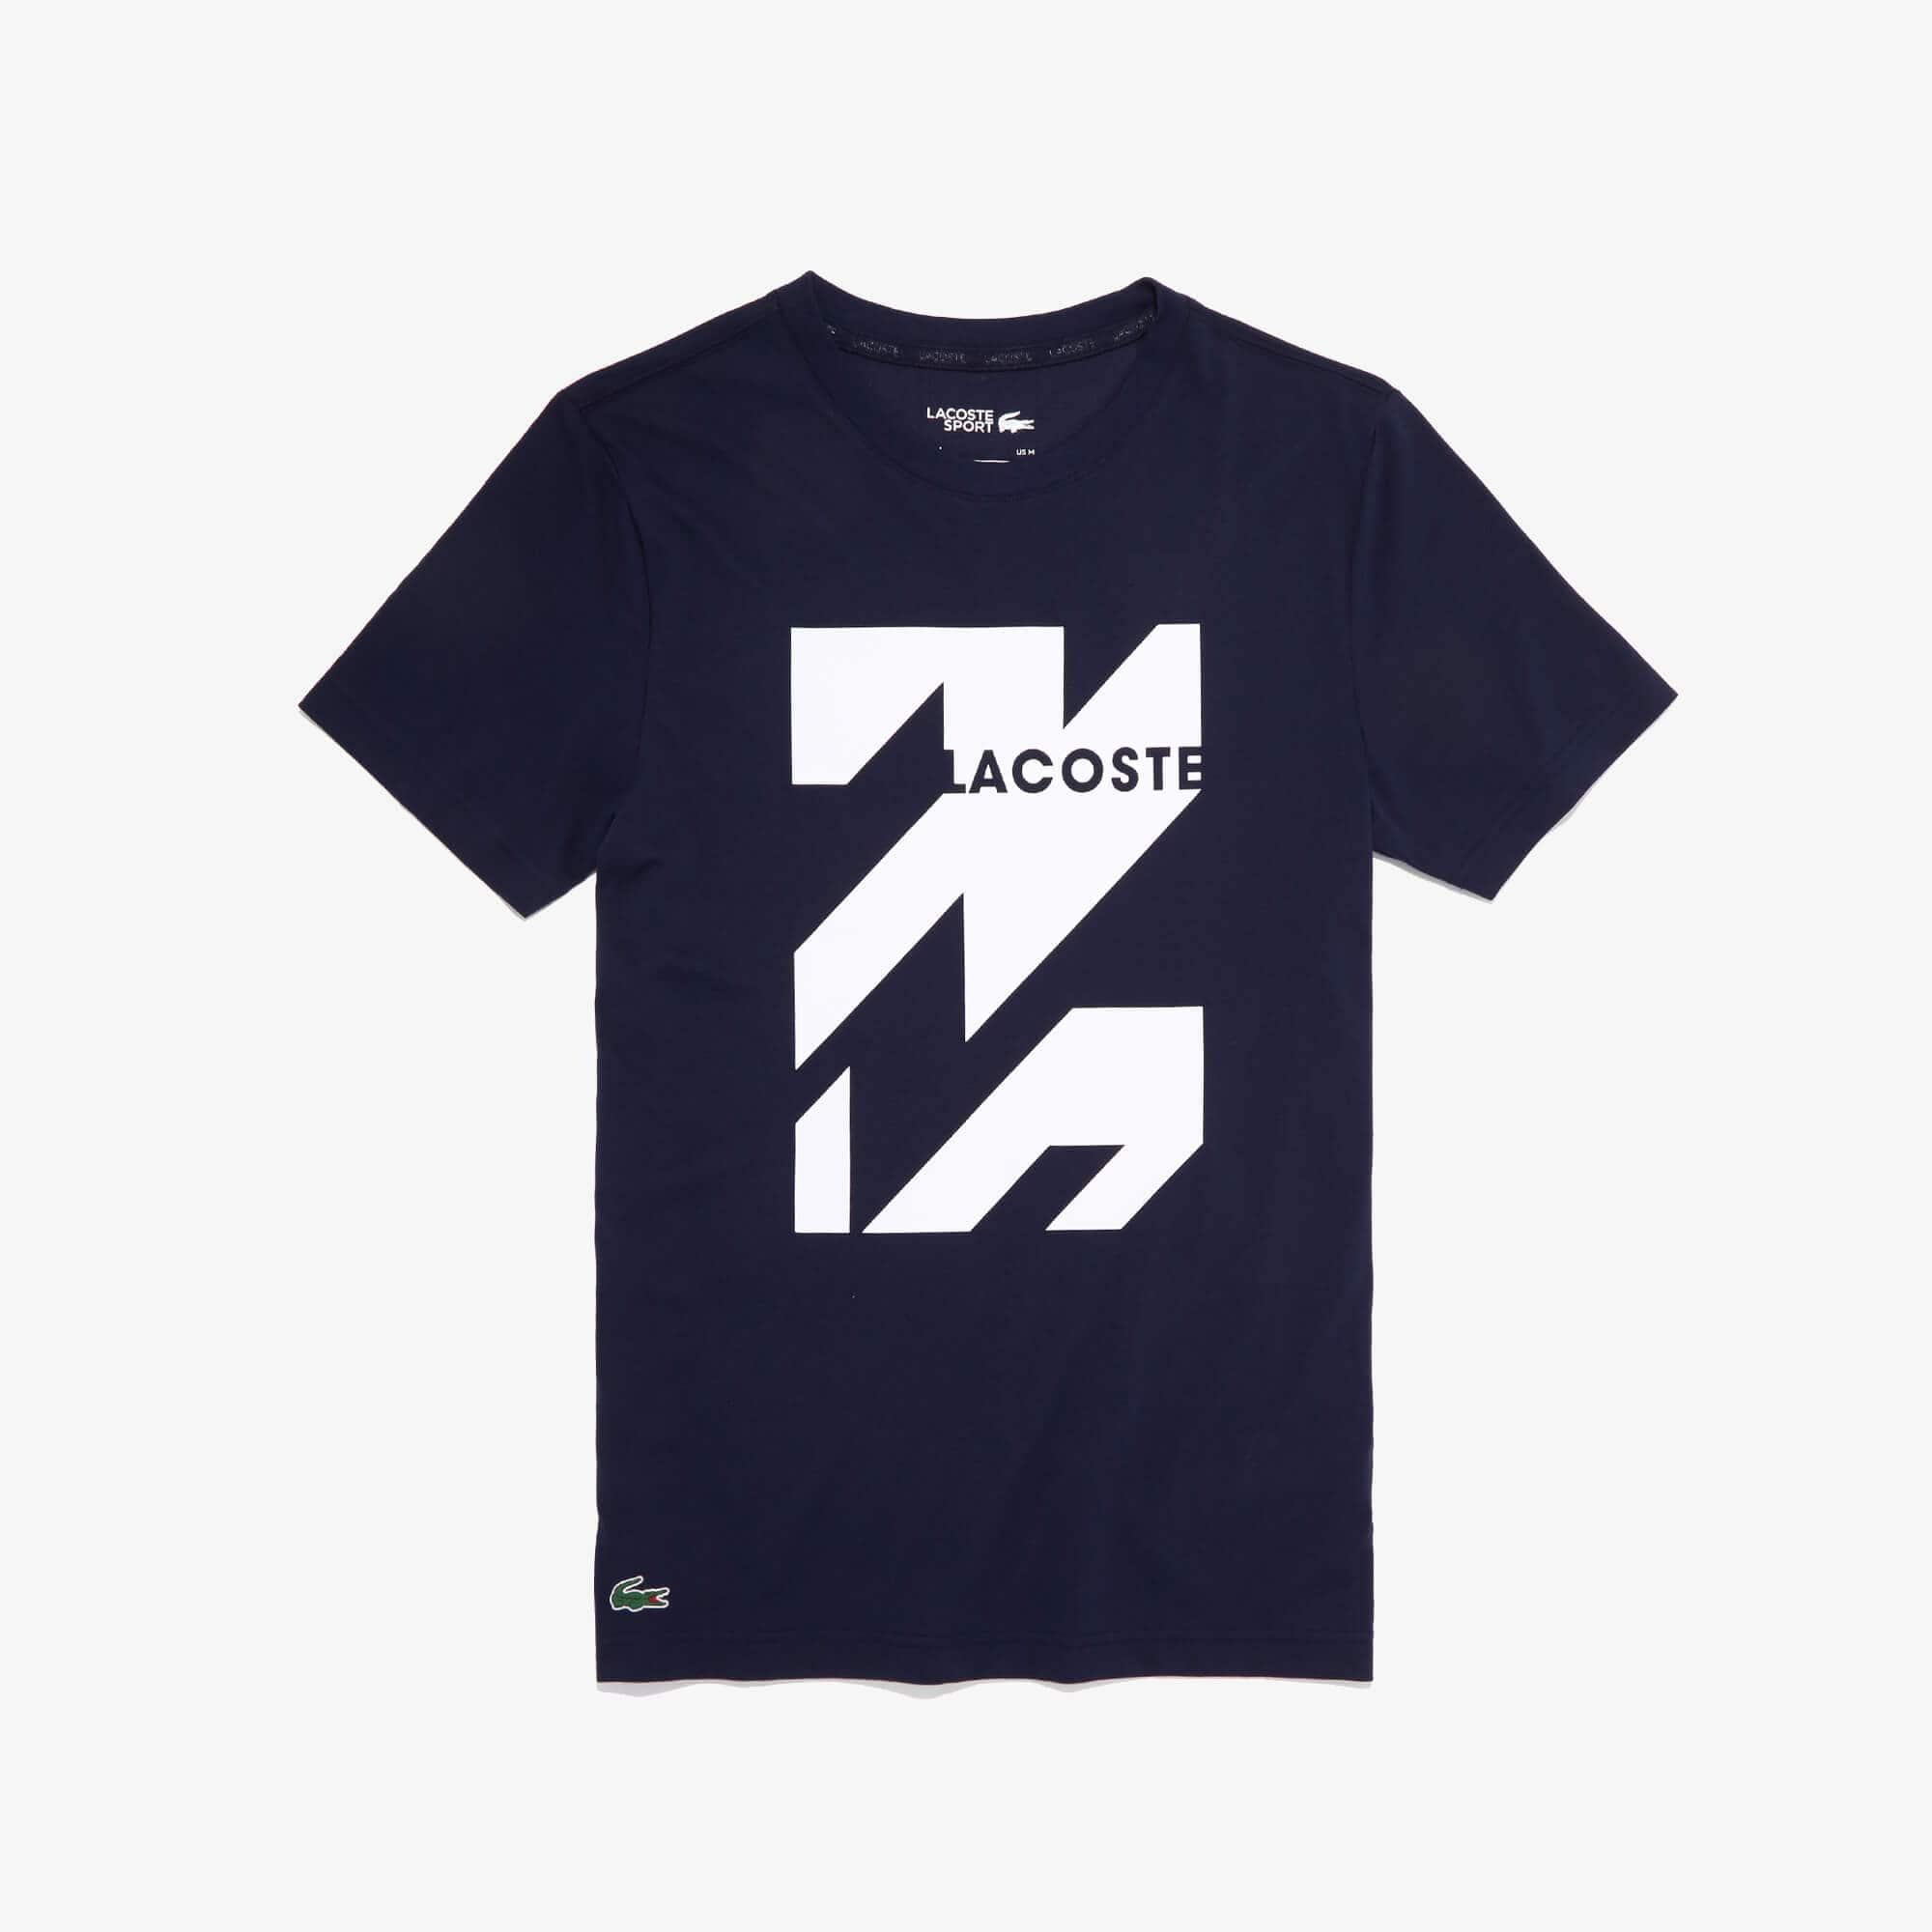 Lacoste Tops Men's SPORT Graphic Print Breathable T-shirt